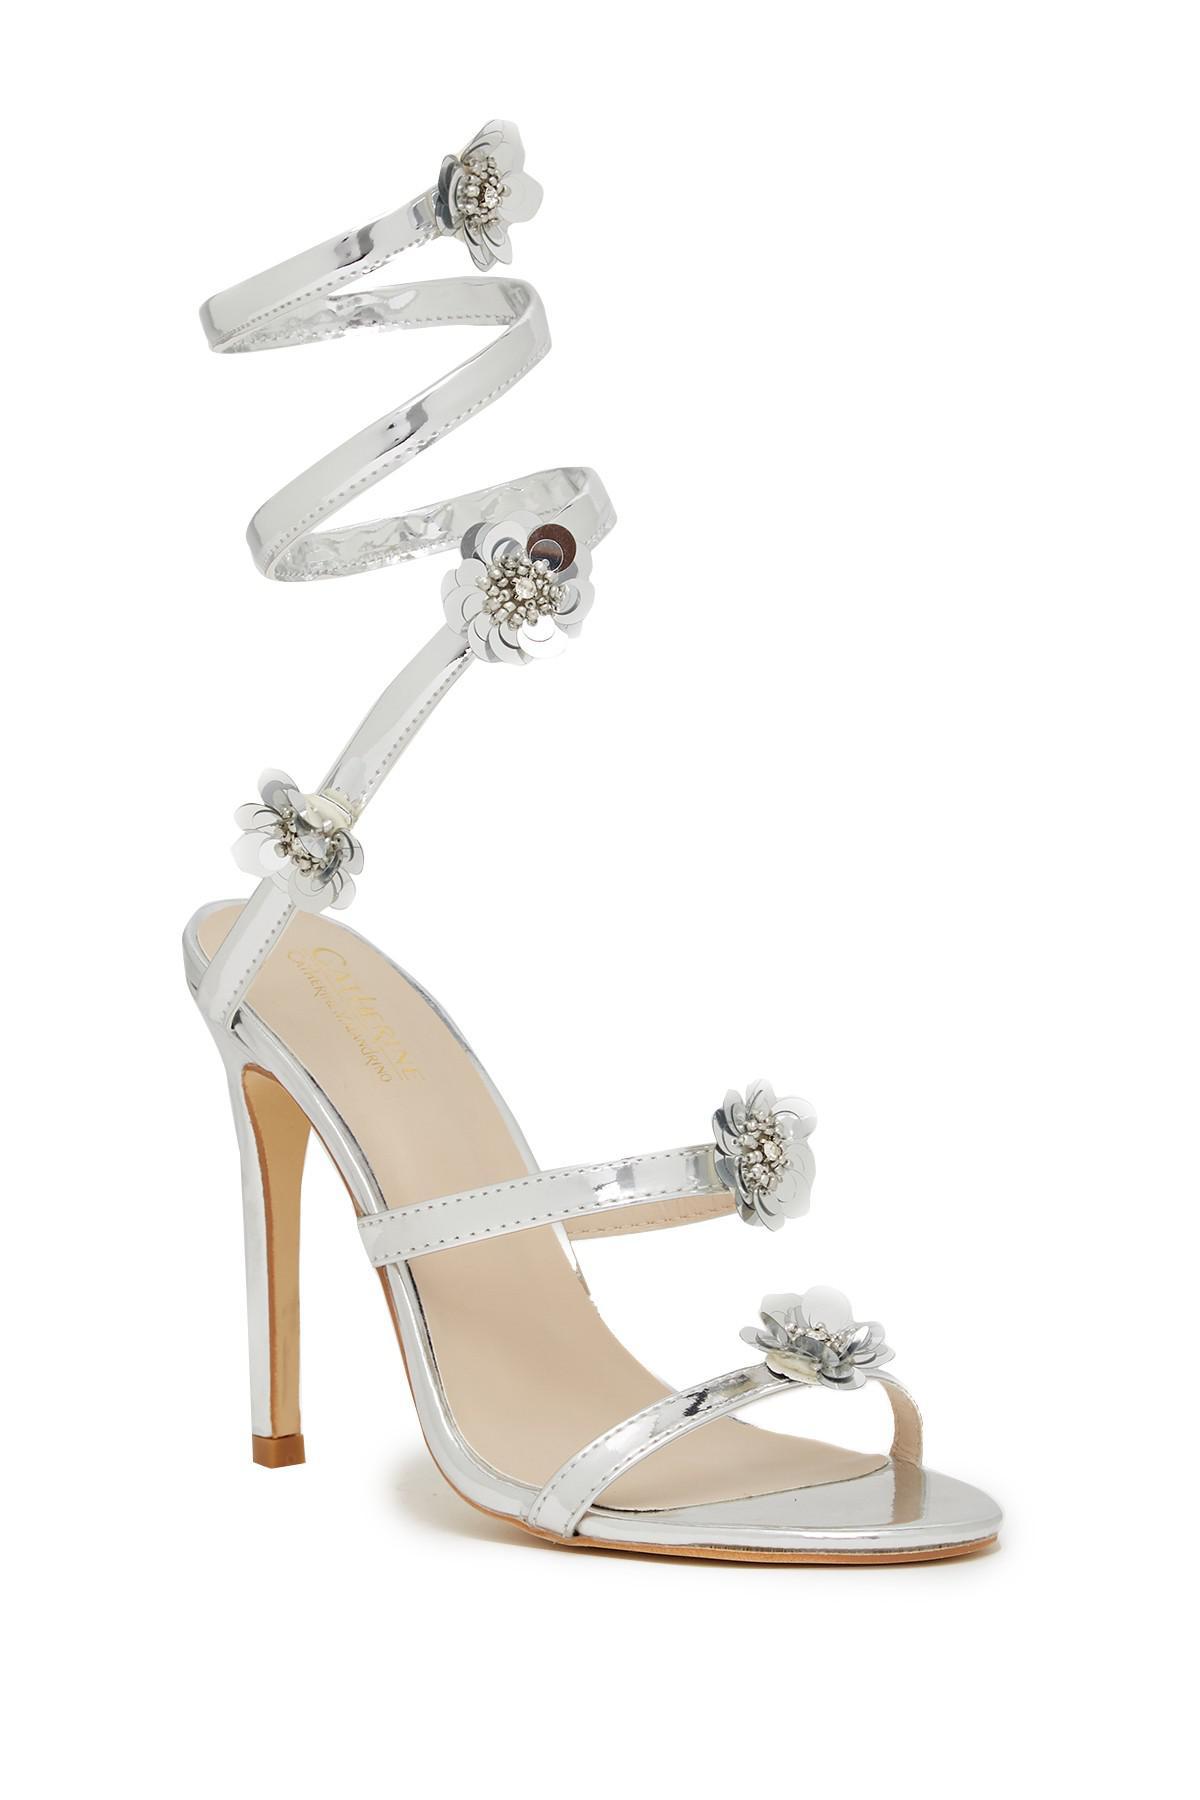 Catherine Catherine Malandrino Clair Wraparound Ankle Stiletto G28N1IE